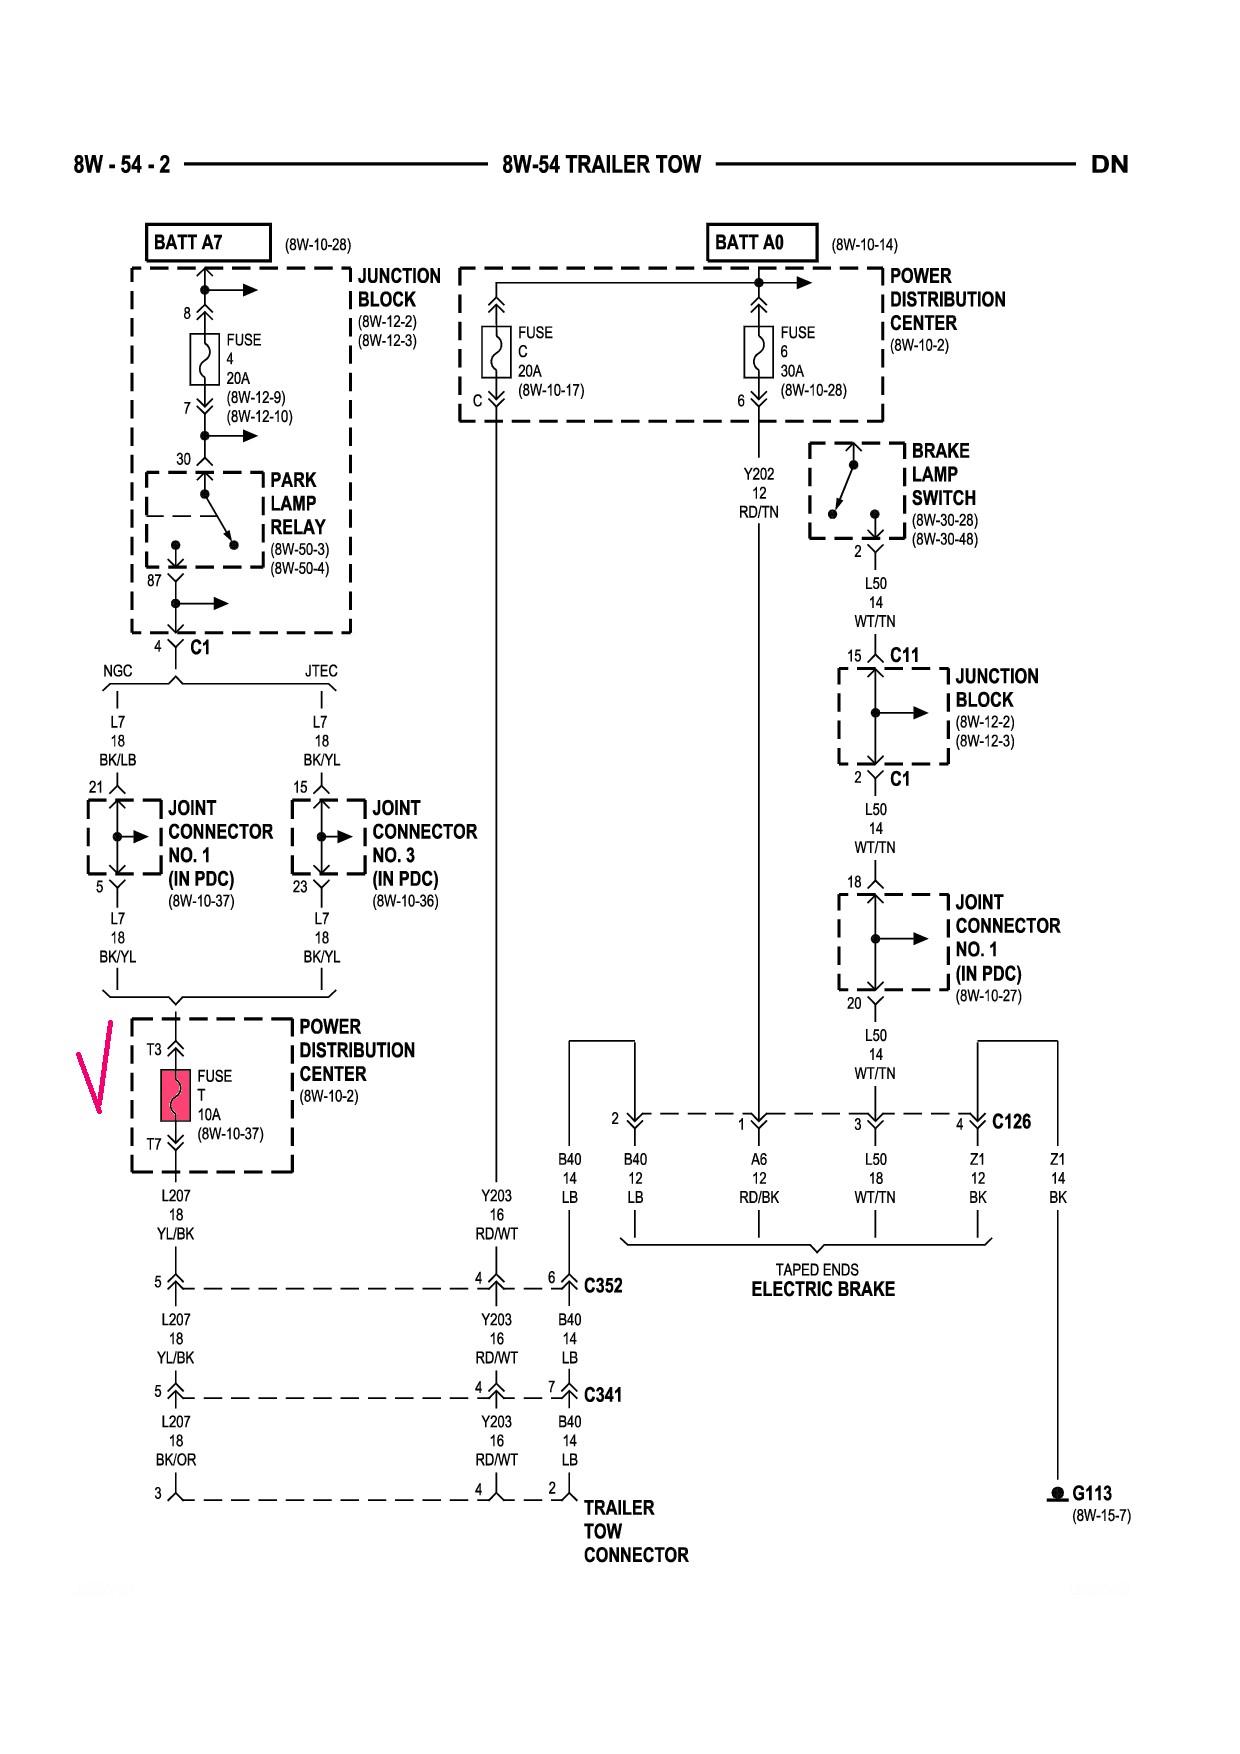 1998 dodge durango infinity stereo wiring diagram stihl br 600 parts free for you 98 engine library rh 30 akszer eu headlight factory radio